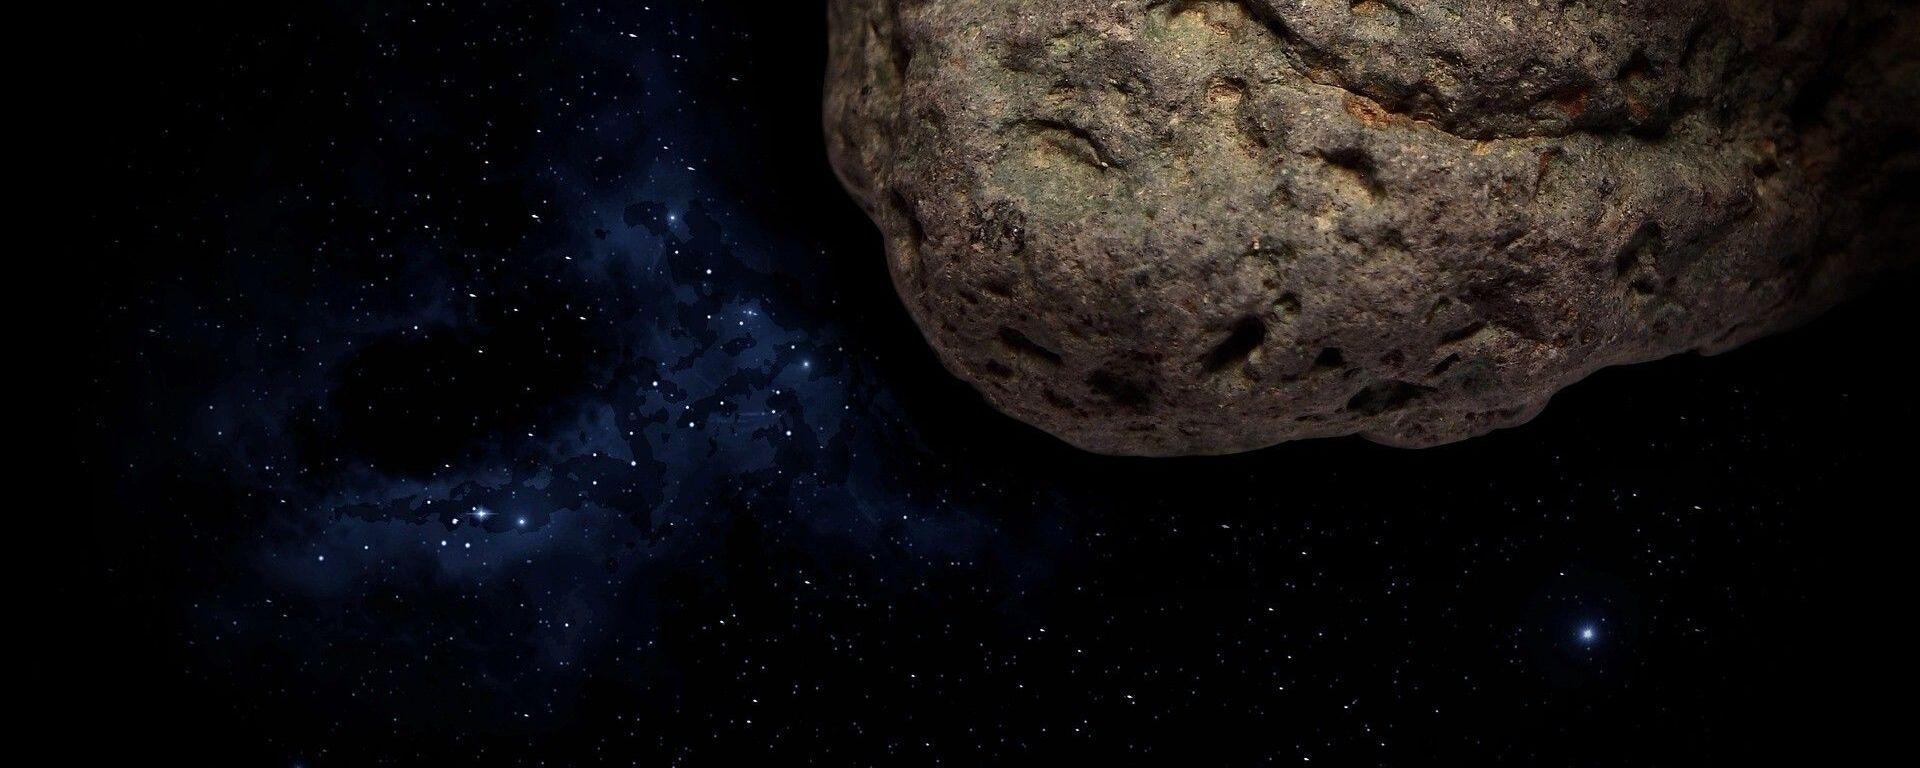 Asteroid — ilustracija - Sputnik Srbija, 1920, 22.09.2021